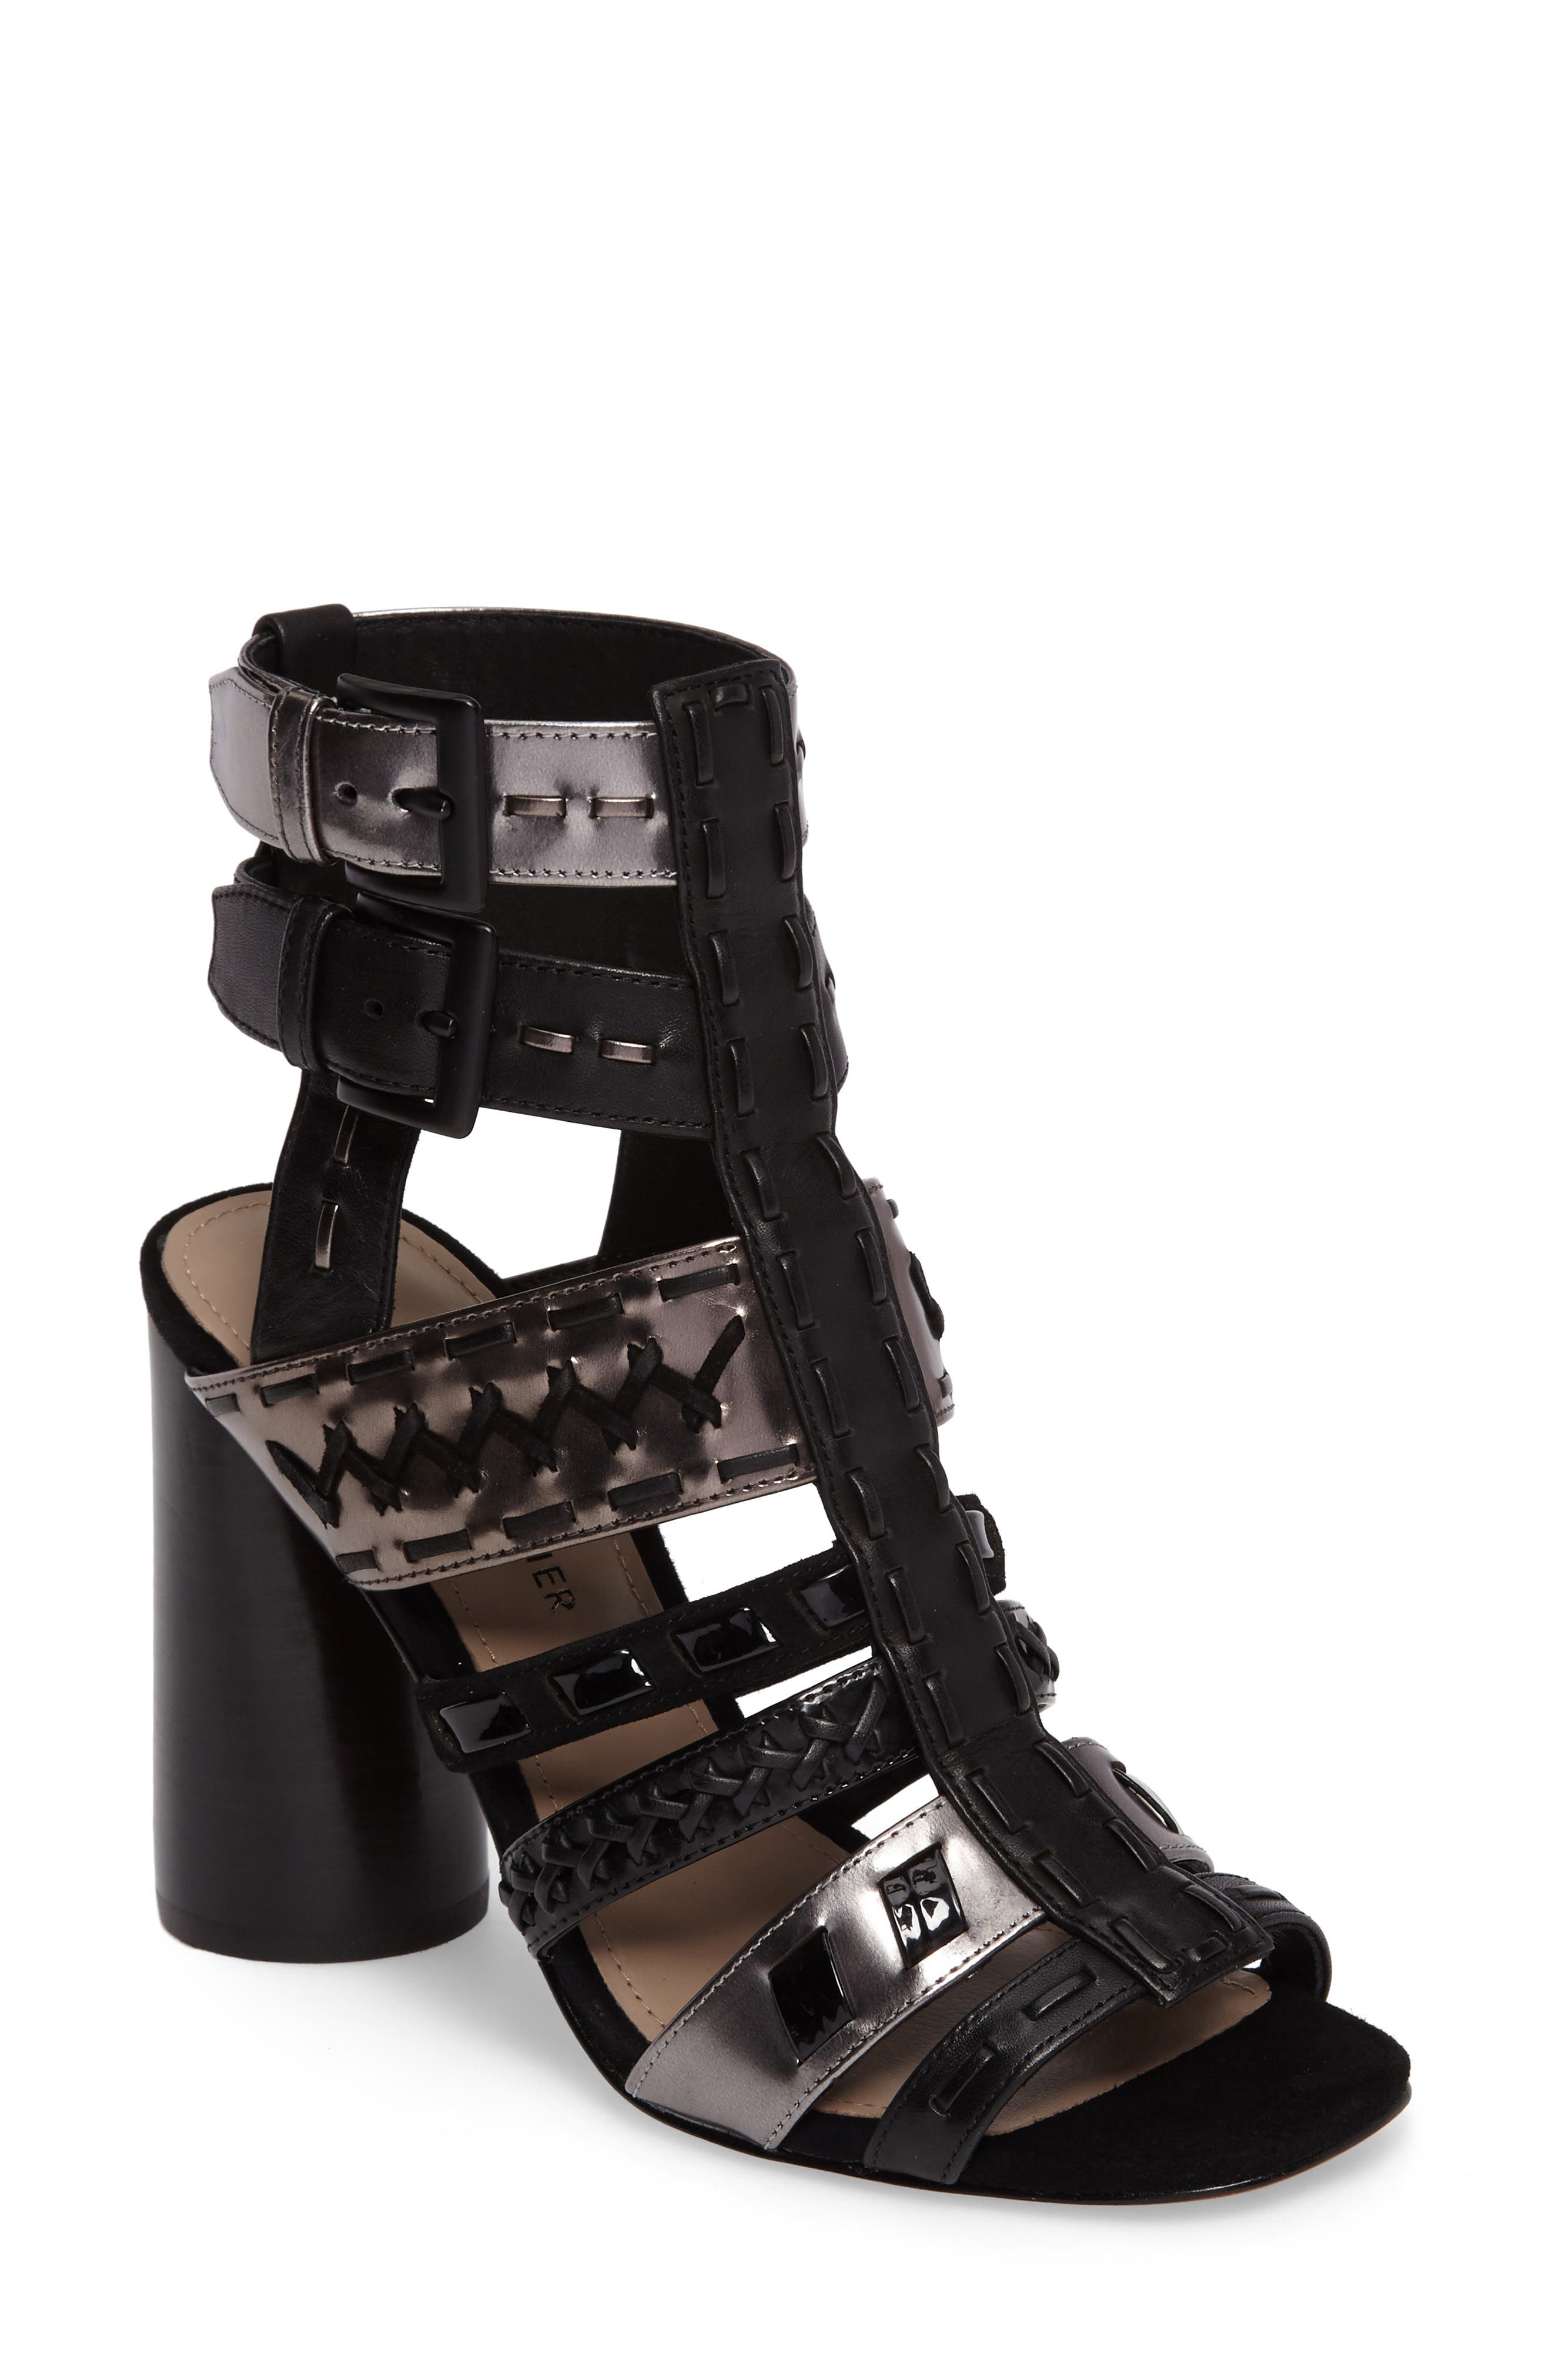 Main Image - Donald J Pliner Bindy Column Heel Cage Sandal (Women)